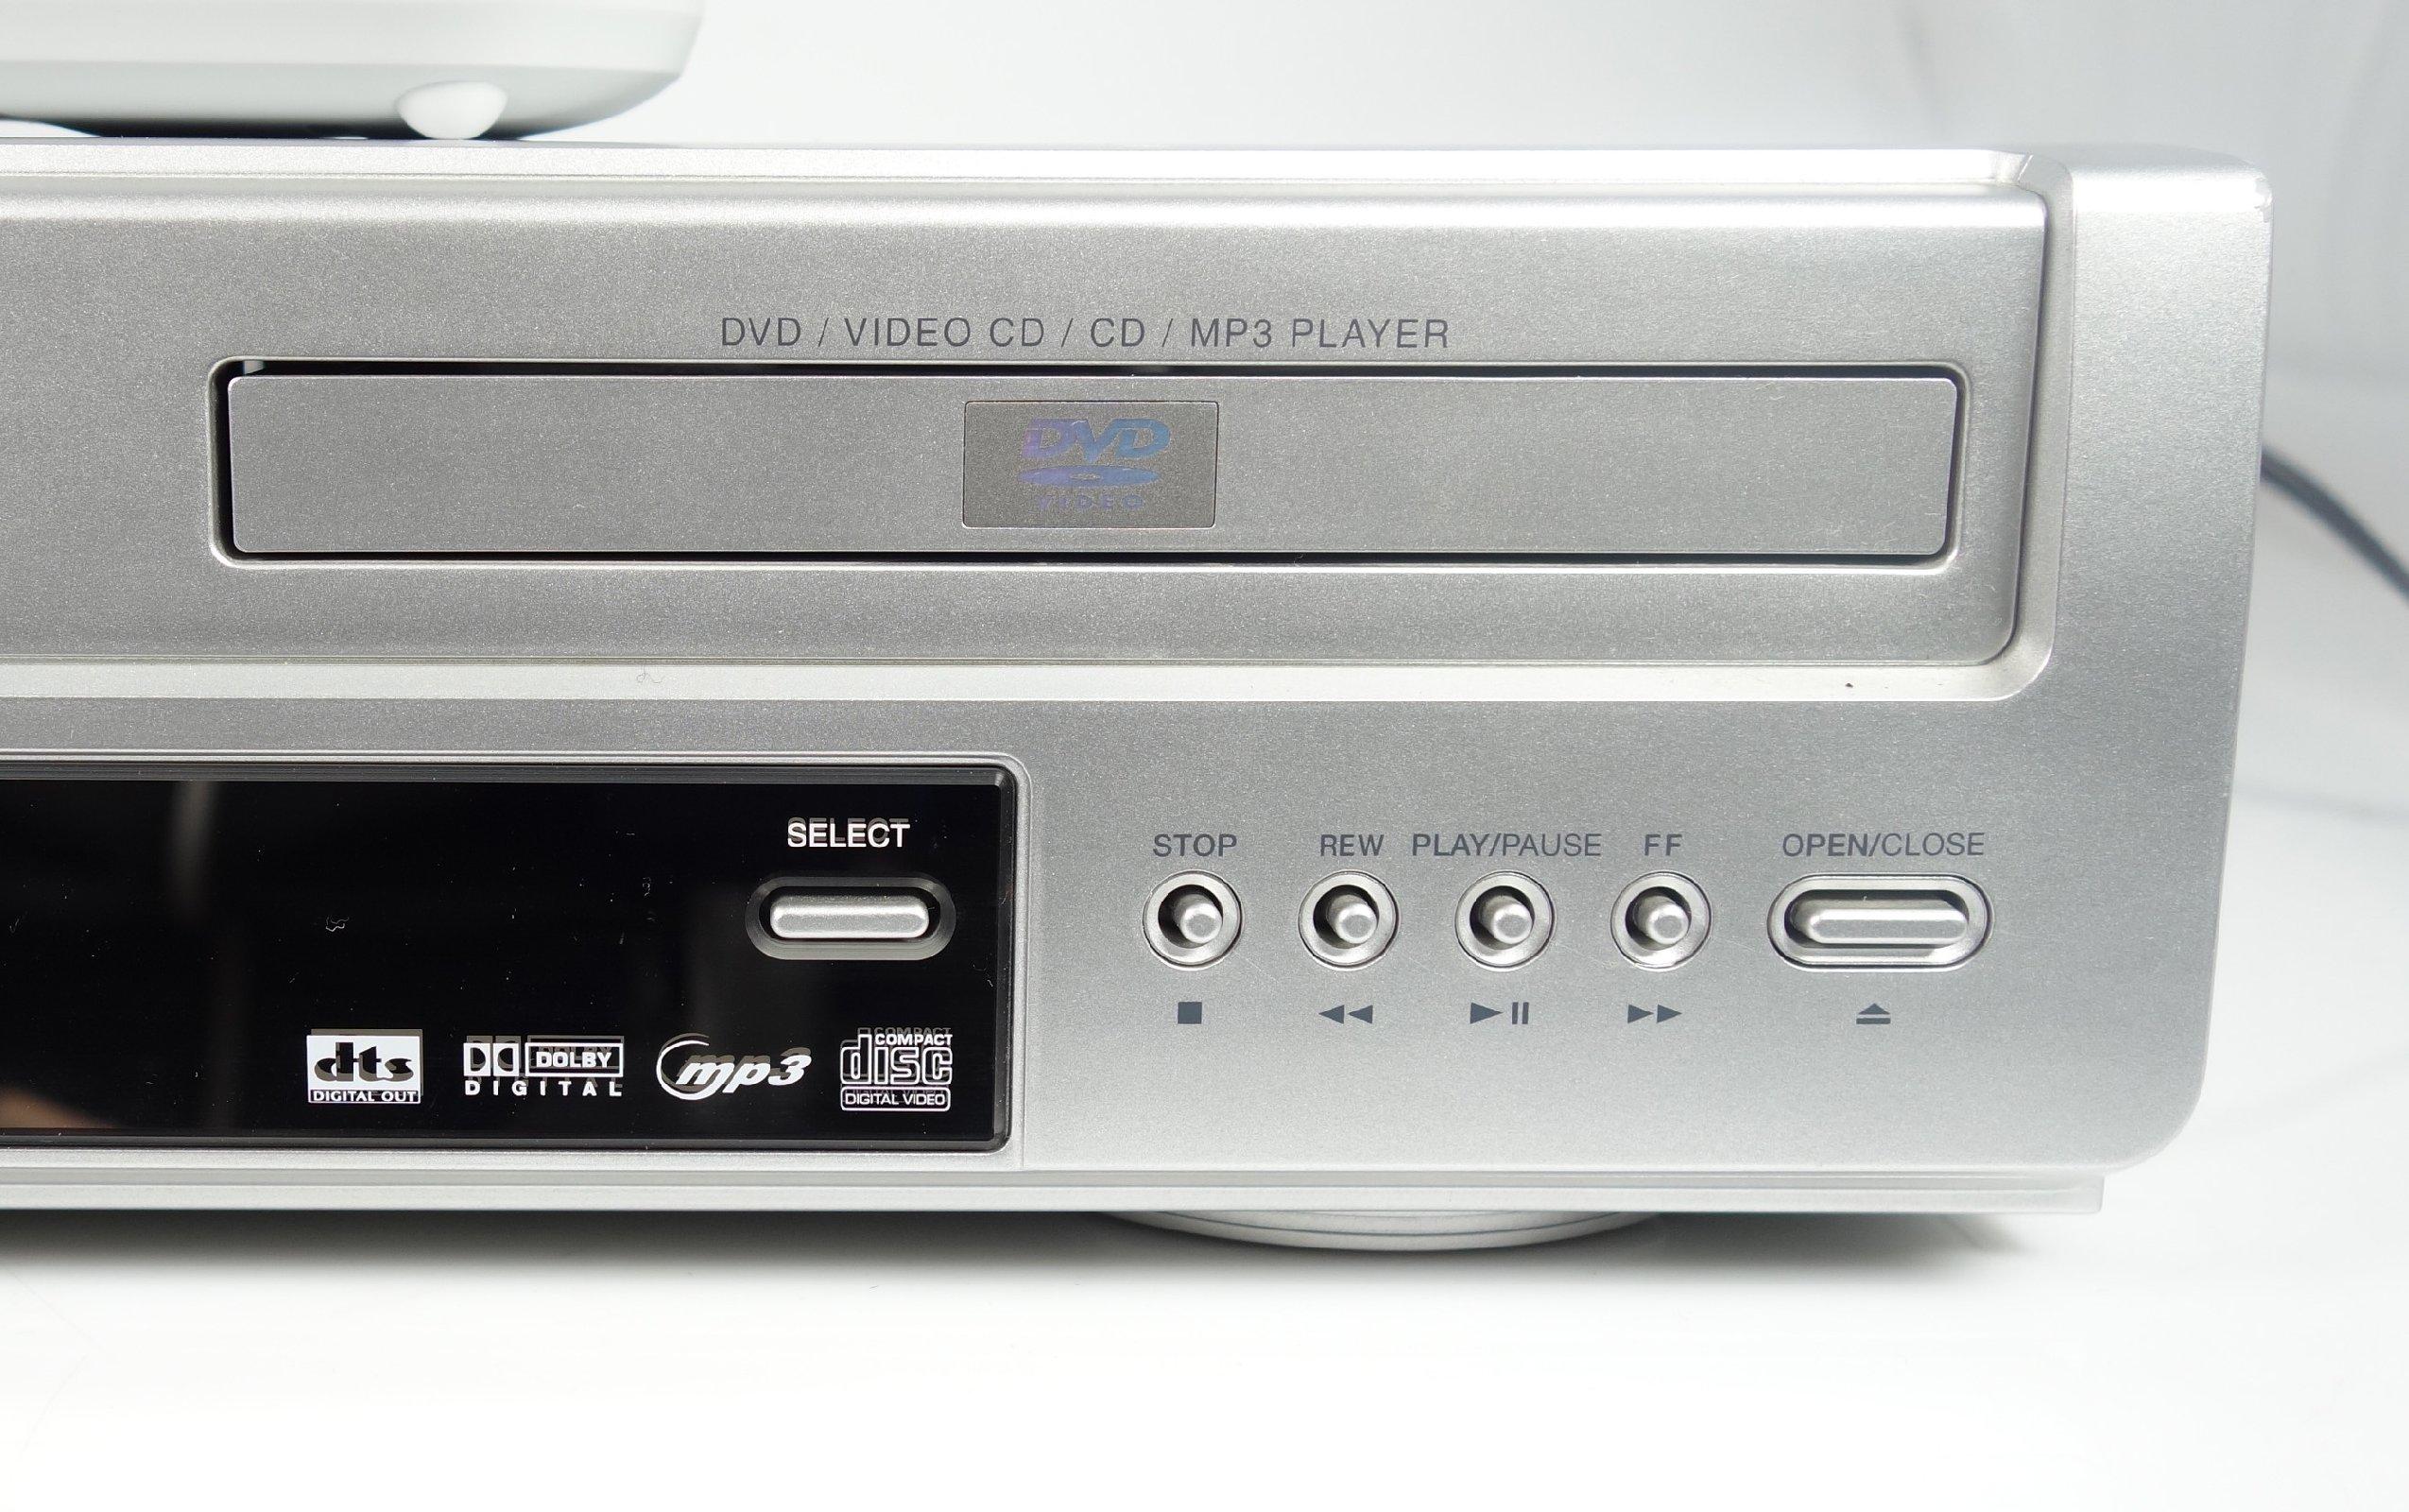 daewoo sh 7840 6 head vhs videorecorder dvd player. Black Bedroom Furniture Sets. Home Design Ideas